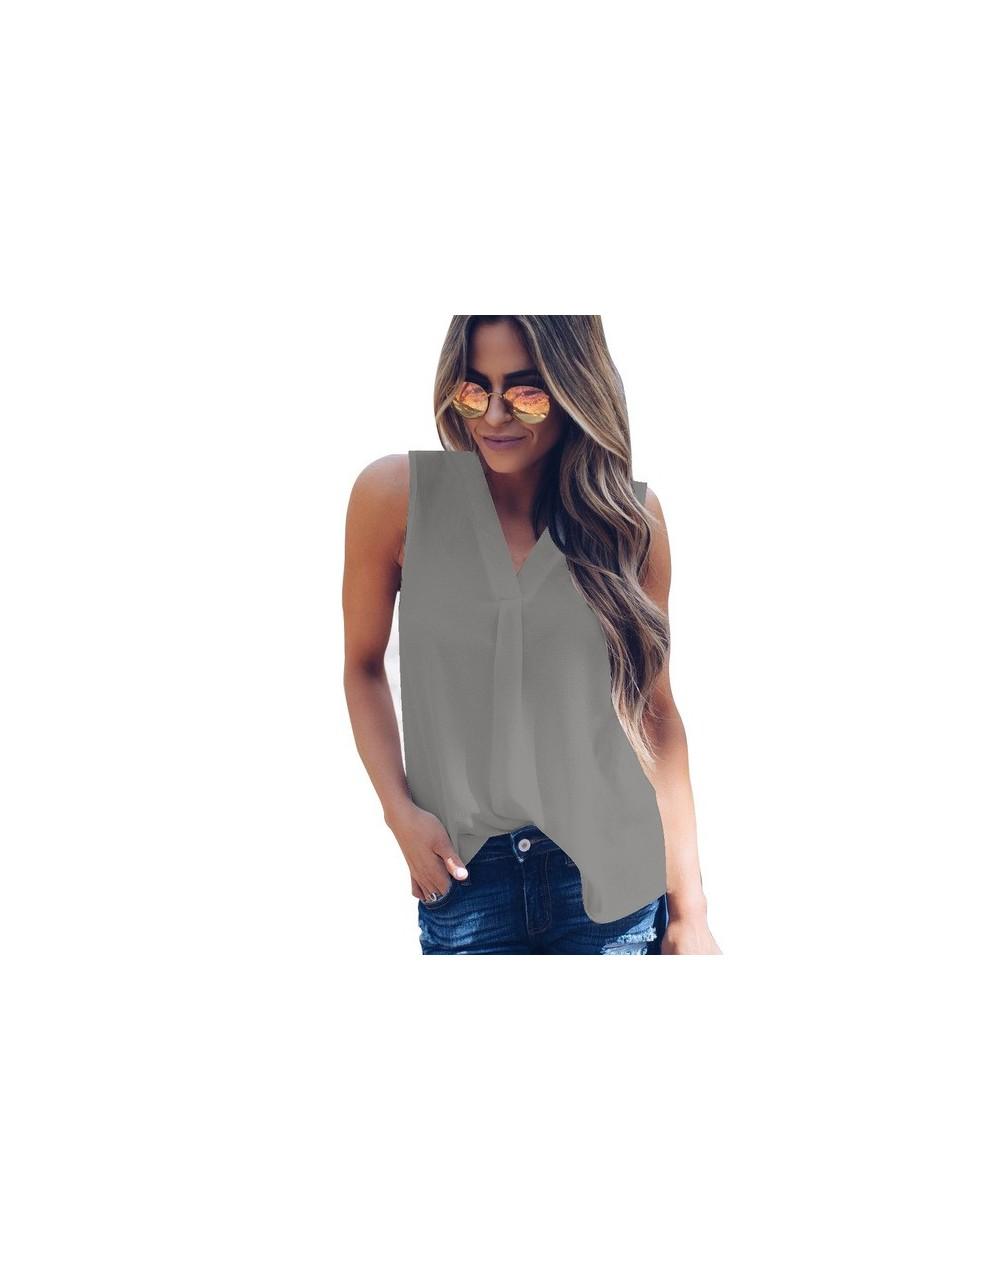 Plus Szie Sleeveless Chiffon Women Tank Summer Lady Office OL Style Solid ButtonTop Vest Casual Loose Female Tank Top S-5XL ...